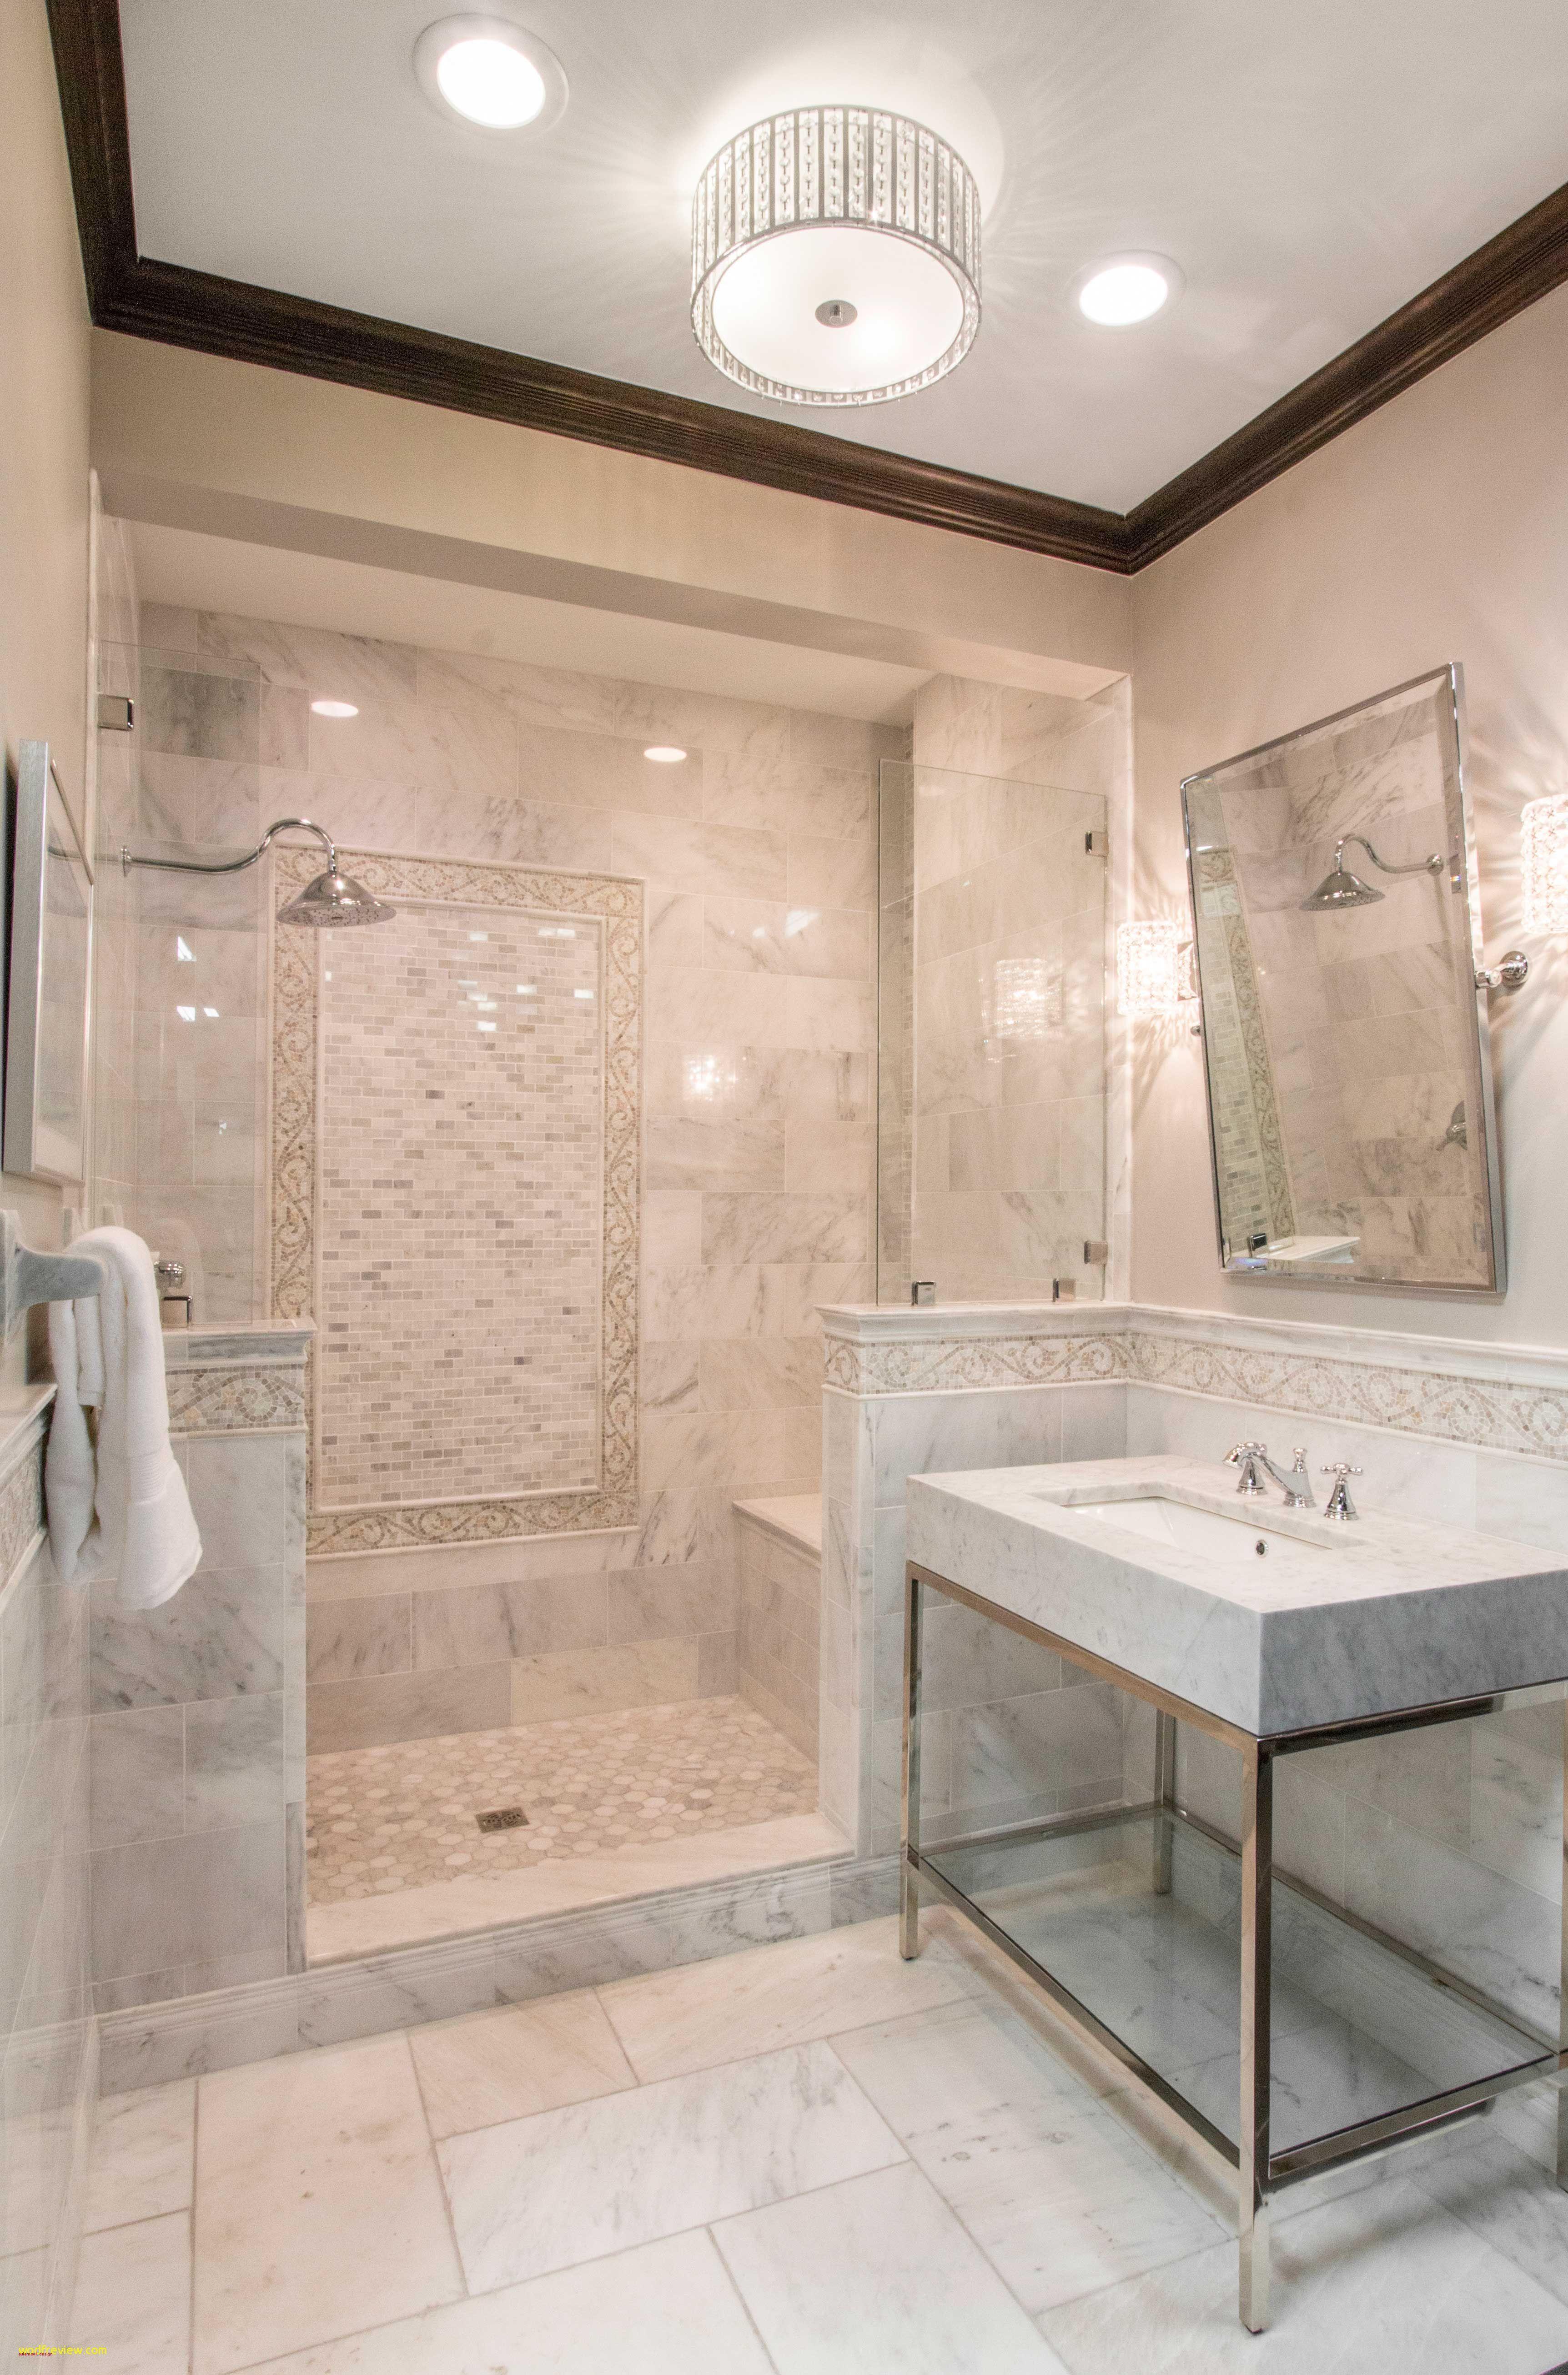 Latest Bathroom Remodel June 2018 Patterned Bathroom Tiles Marble Bathroom Designs Bathroom Interior Bathroom ideas carrara marble